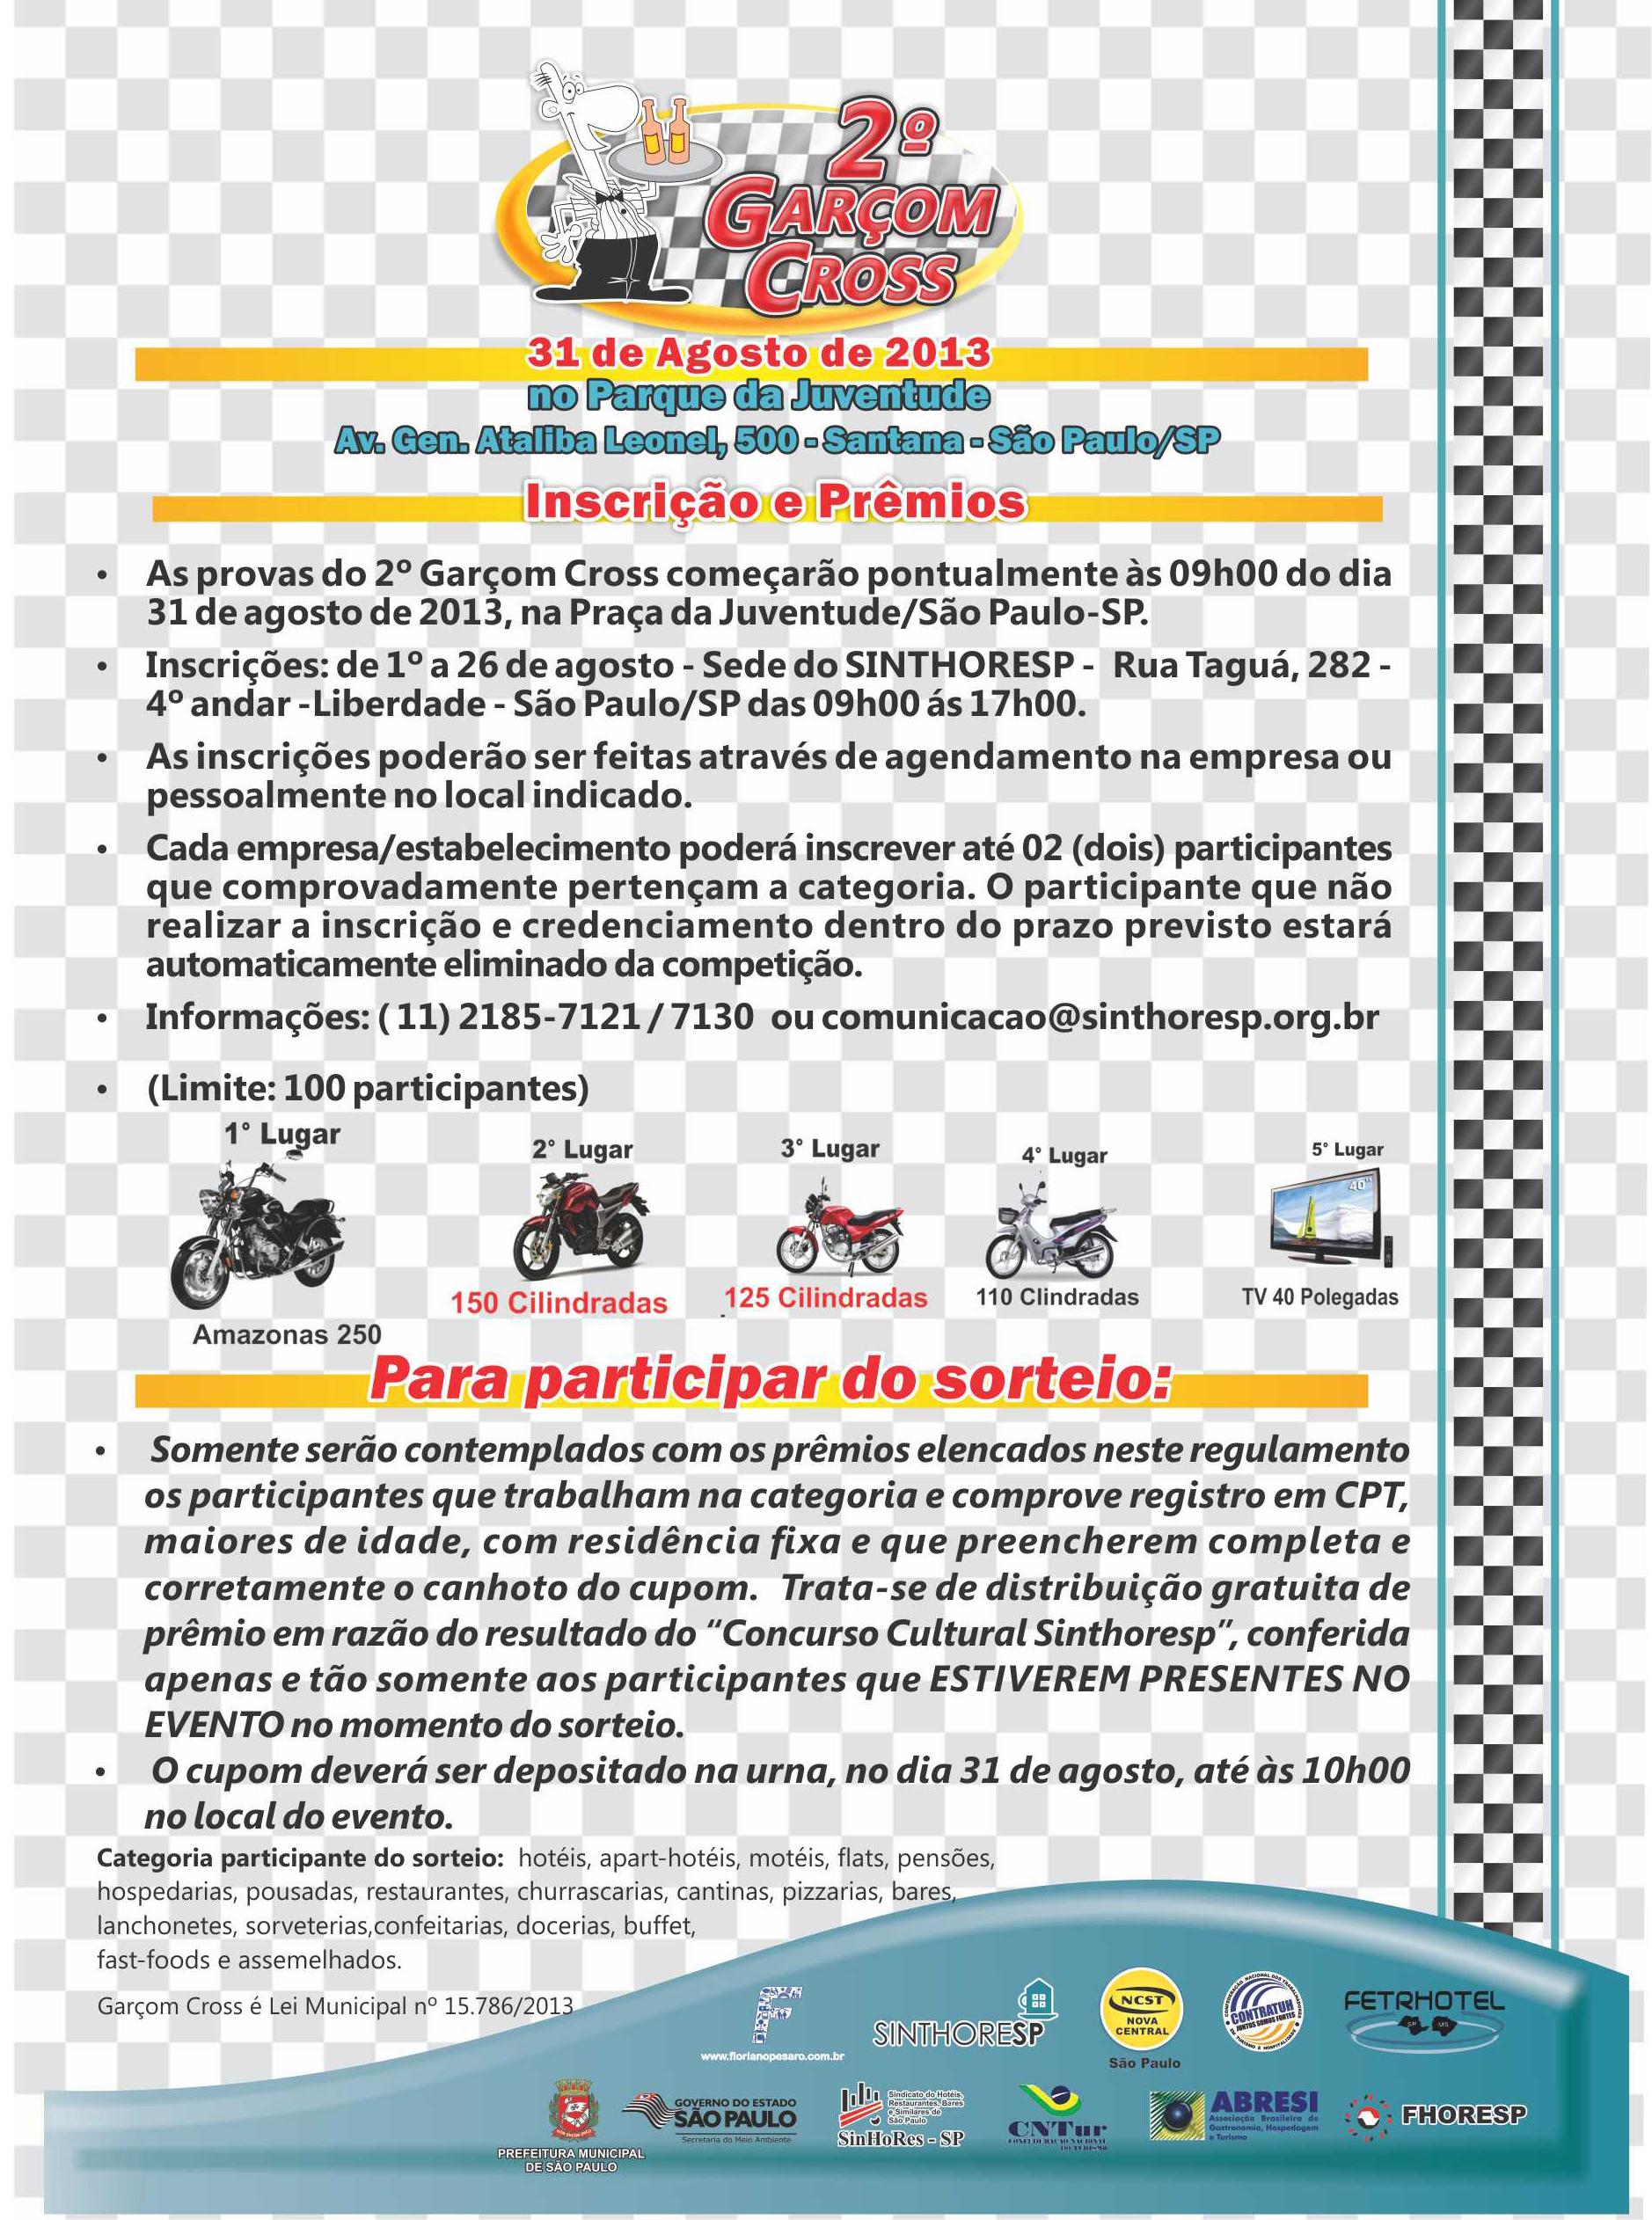 Sinthoresp Garçon Cross informações